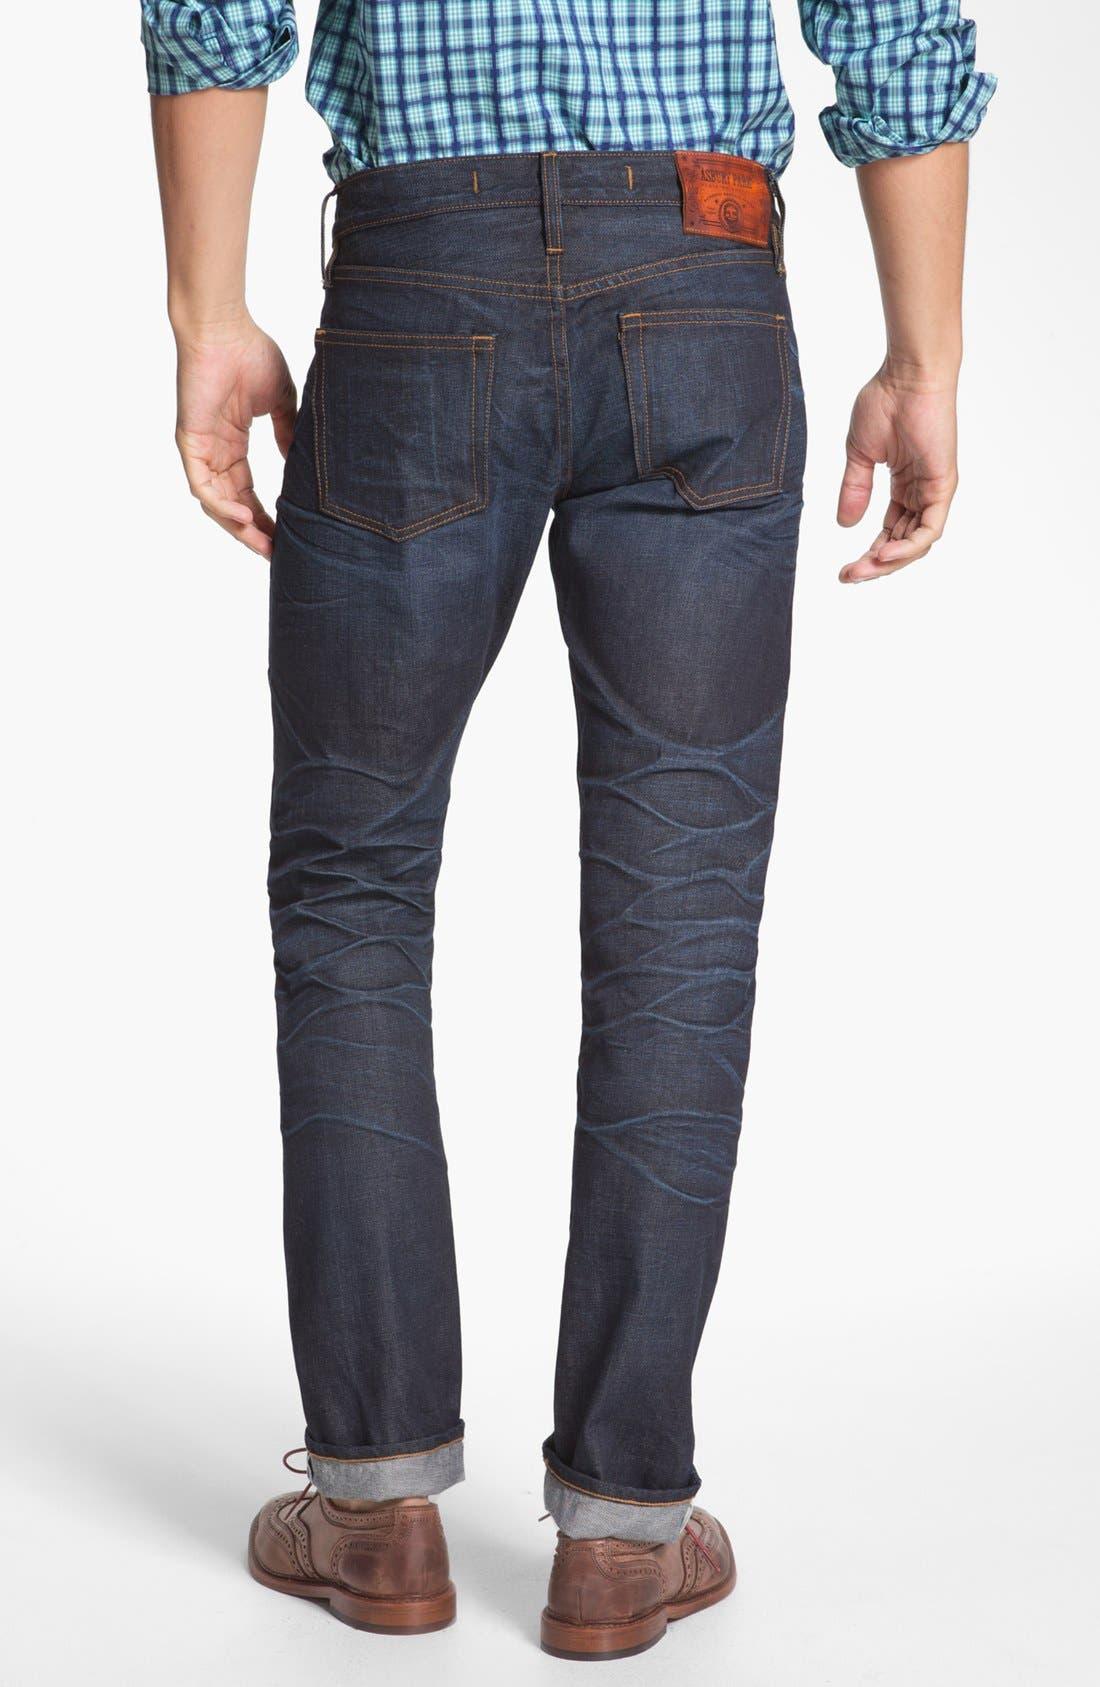 Alternate Image 2  - Asbury Park '1888 Skinny Fit' Raw Selvedge Jeans